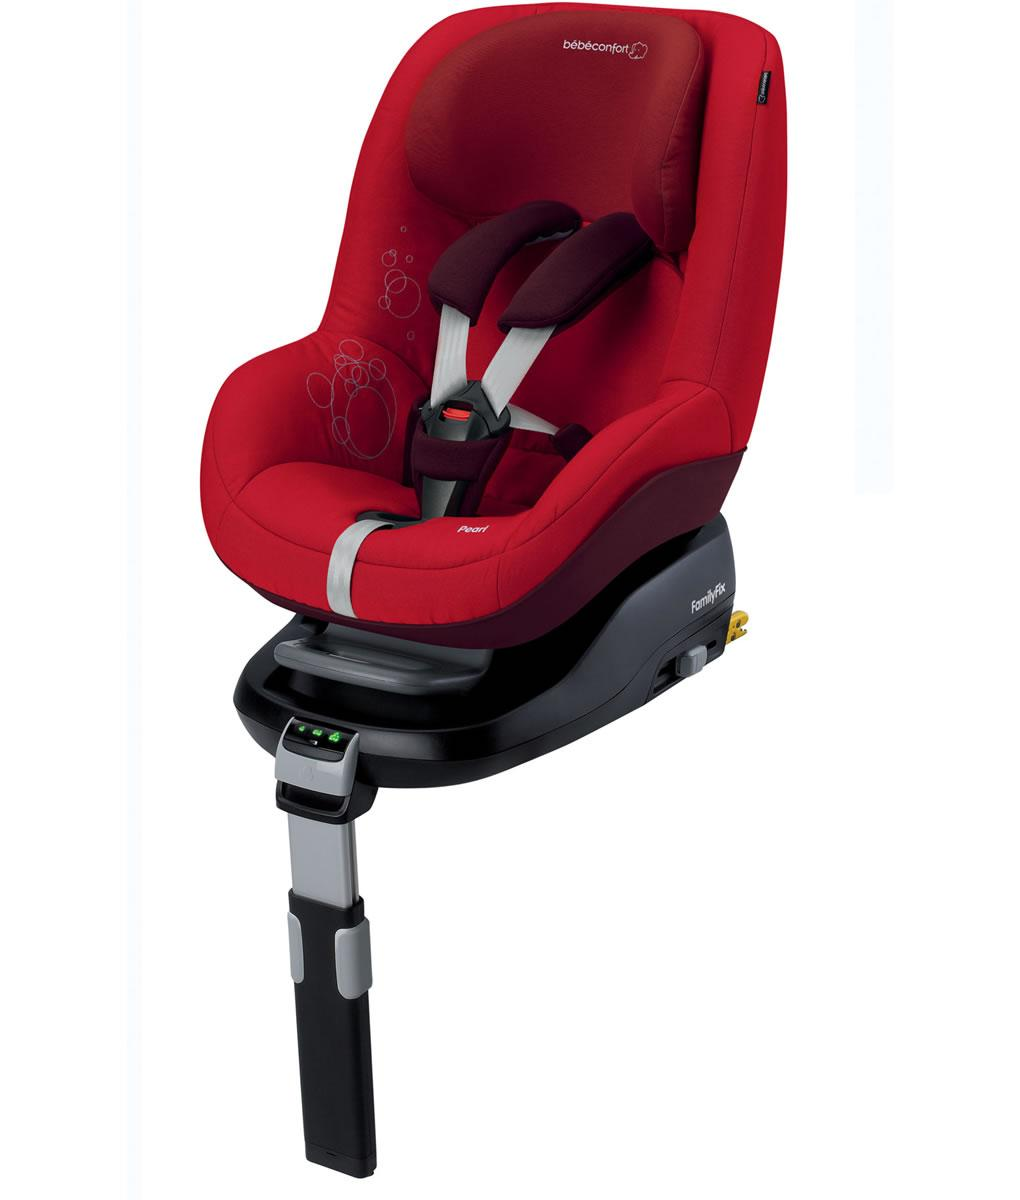 Foto silla grupo 0 pebble dress blue de bebe confort foto for Sillas coche bebe grupos